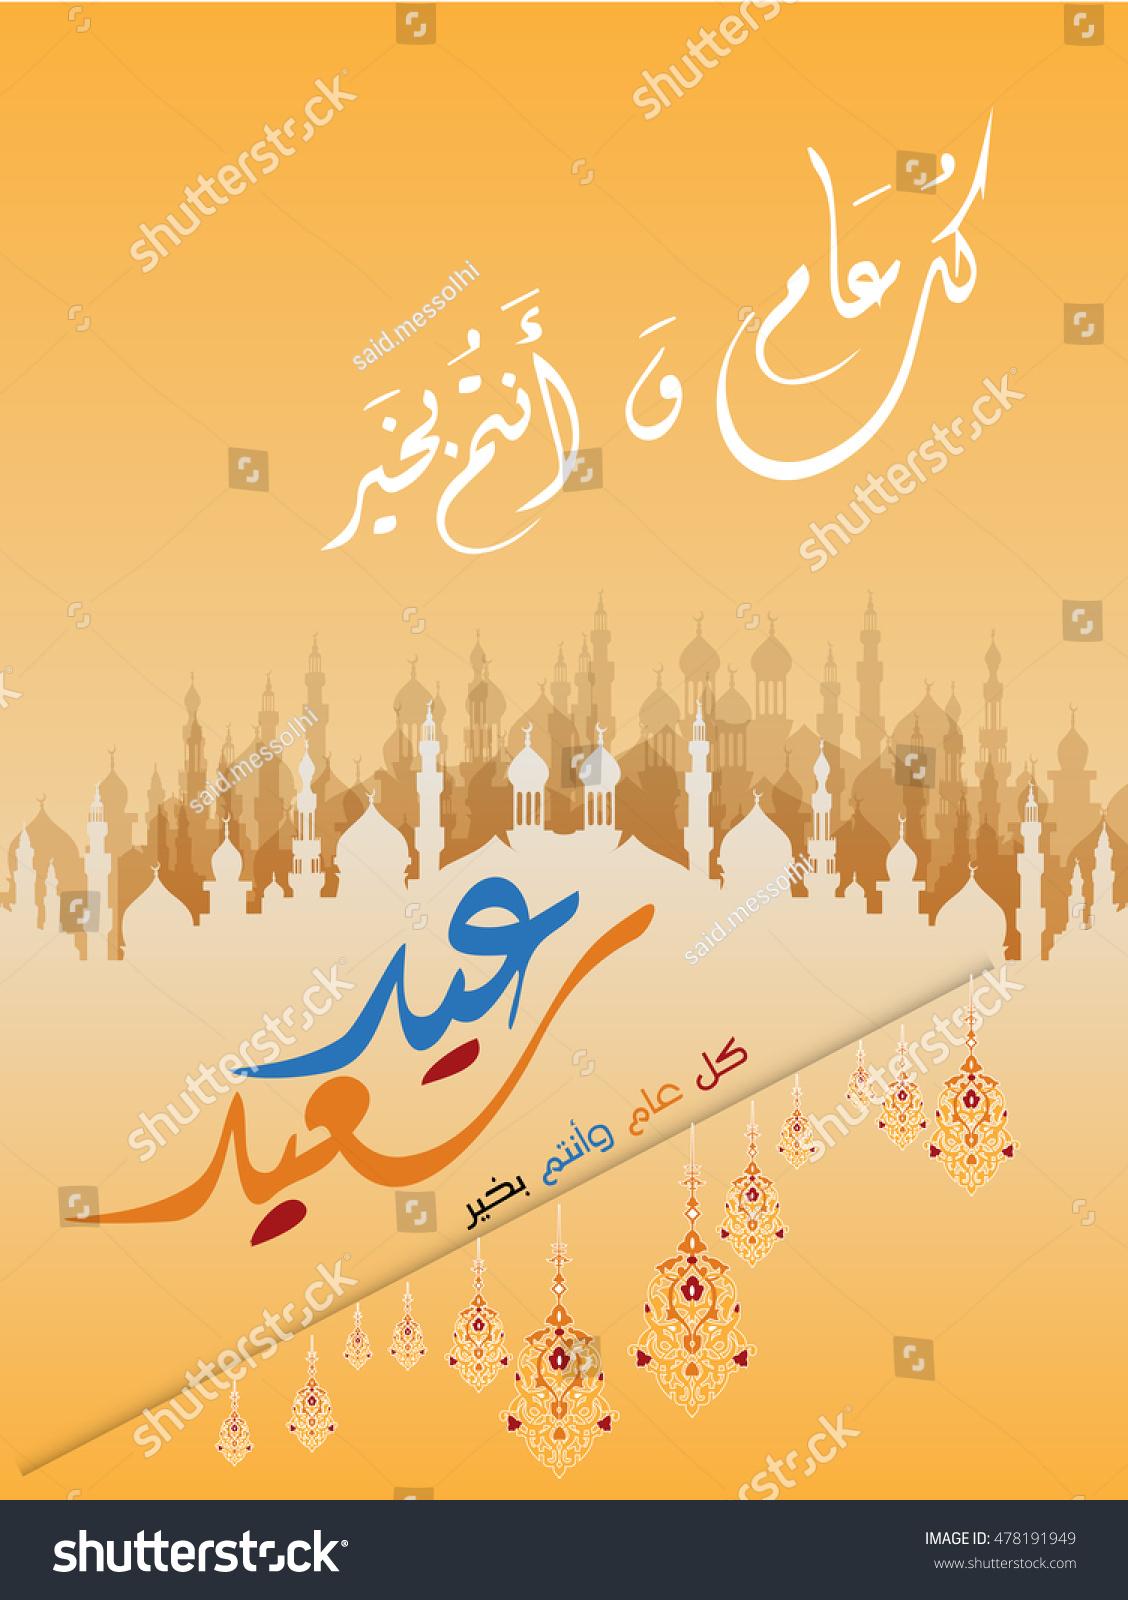 Eid mubarak wishes image 2016 eid stock vector royalty free eid mubarak wishes image 2016 eid mubarak messages greetings card aid said or m4hsunfo